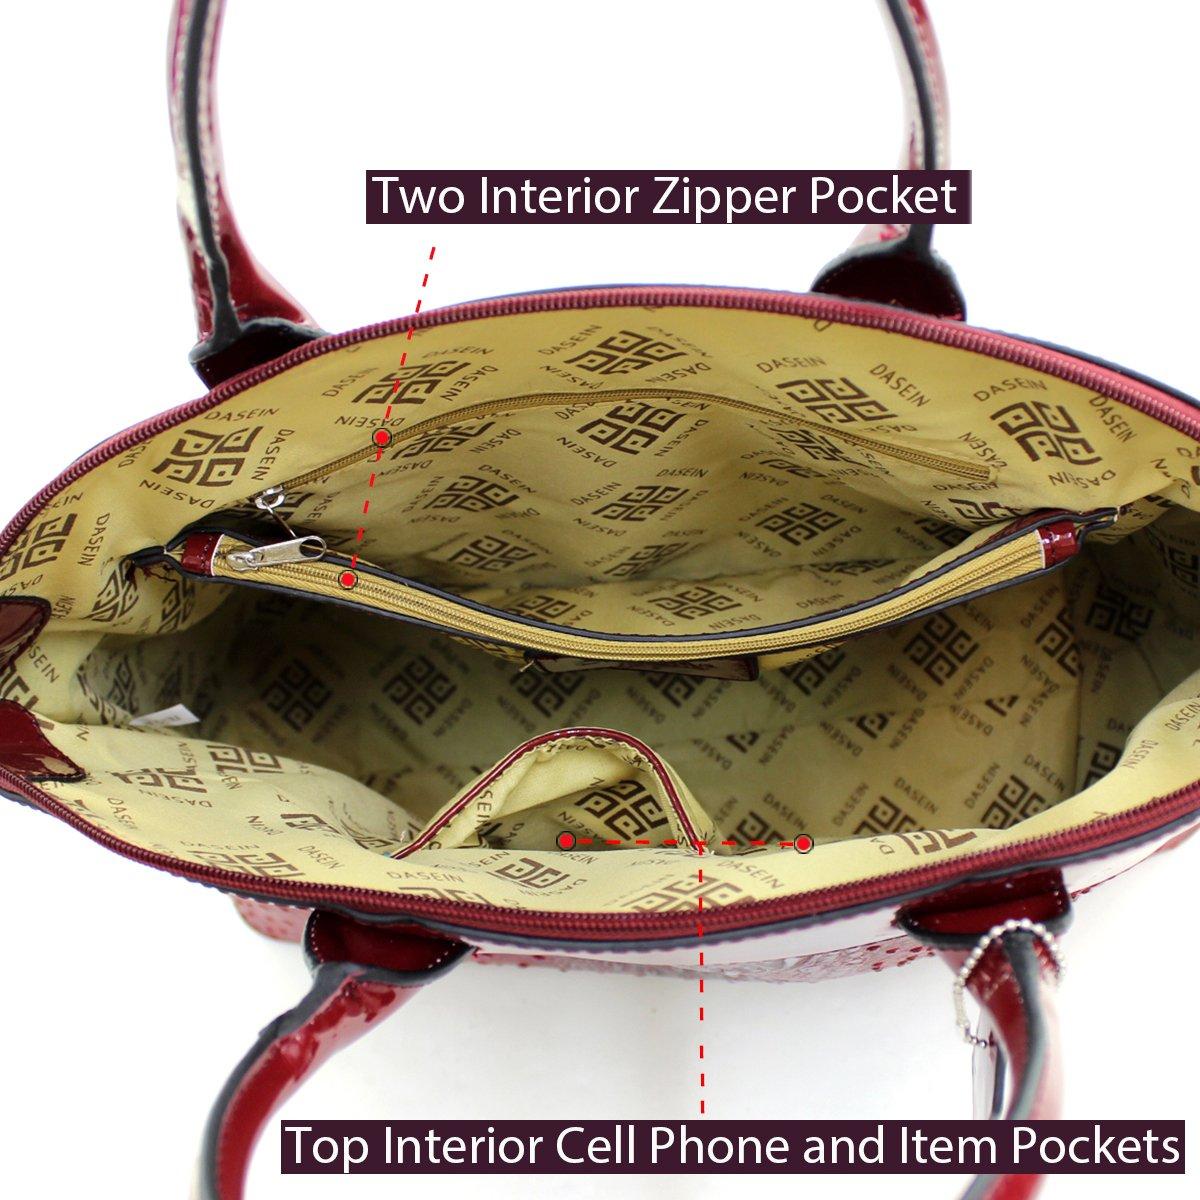 8f3de448fa07 Amazon.com  Dasein Ostrich Large Classic Elegantly structured Satchel Tote  Shoulder Bag Handbag with Removable Shoulder Strap - Black  Shoes